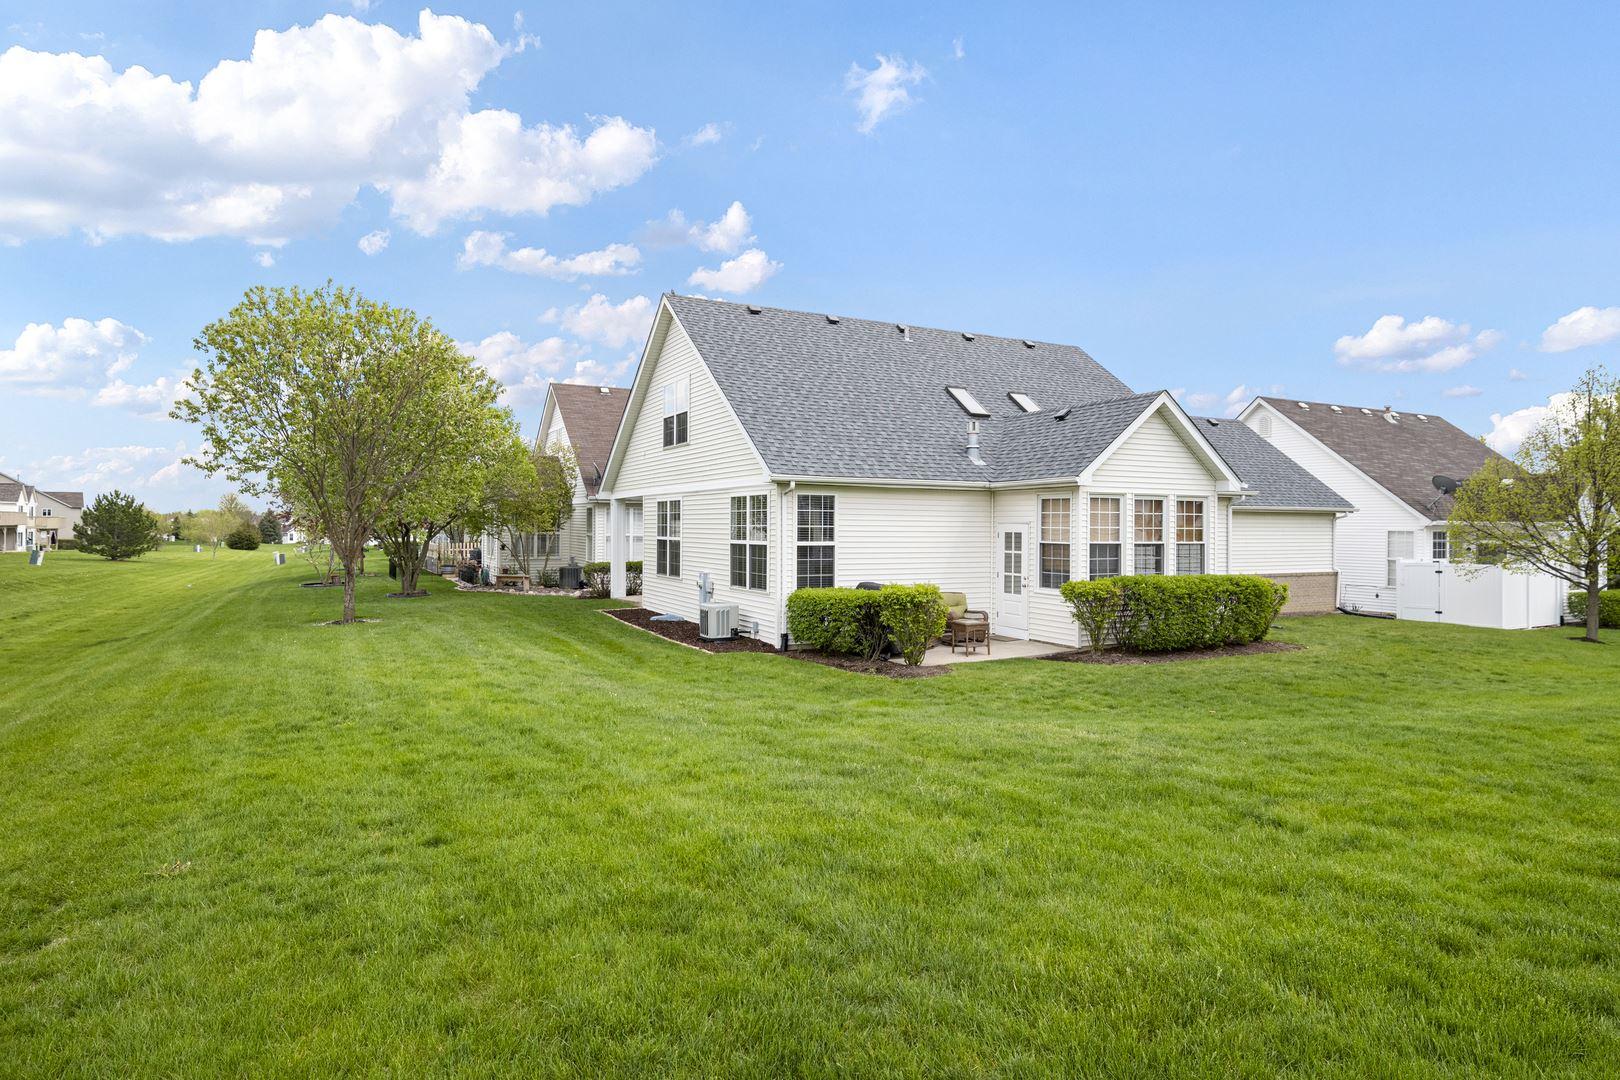 Photo of 1716 Devonshire Lane, Shorewood, IL 60404 (MLS # 11072356)